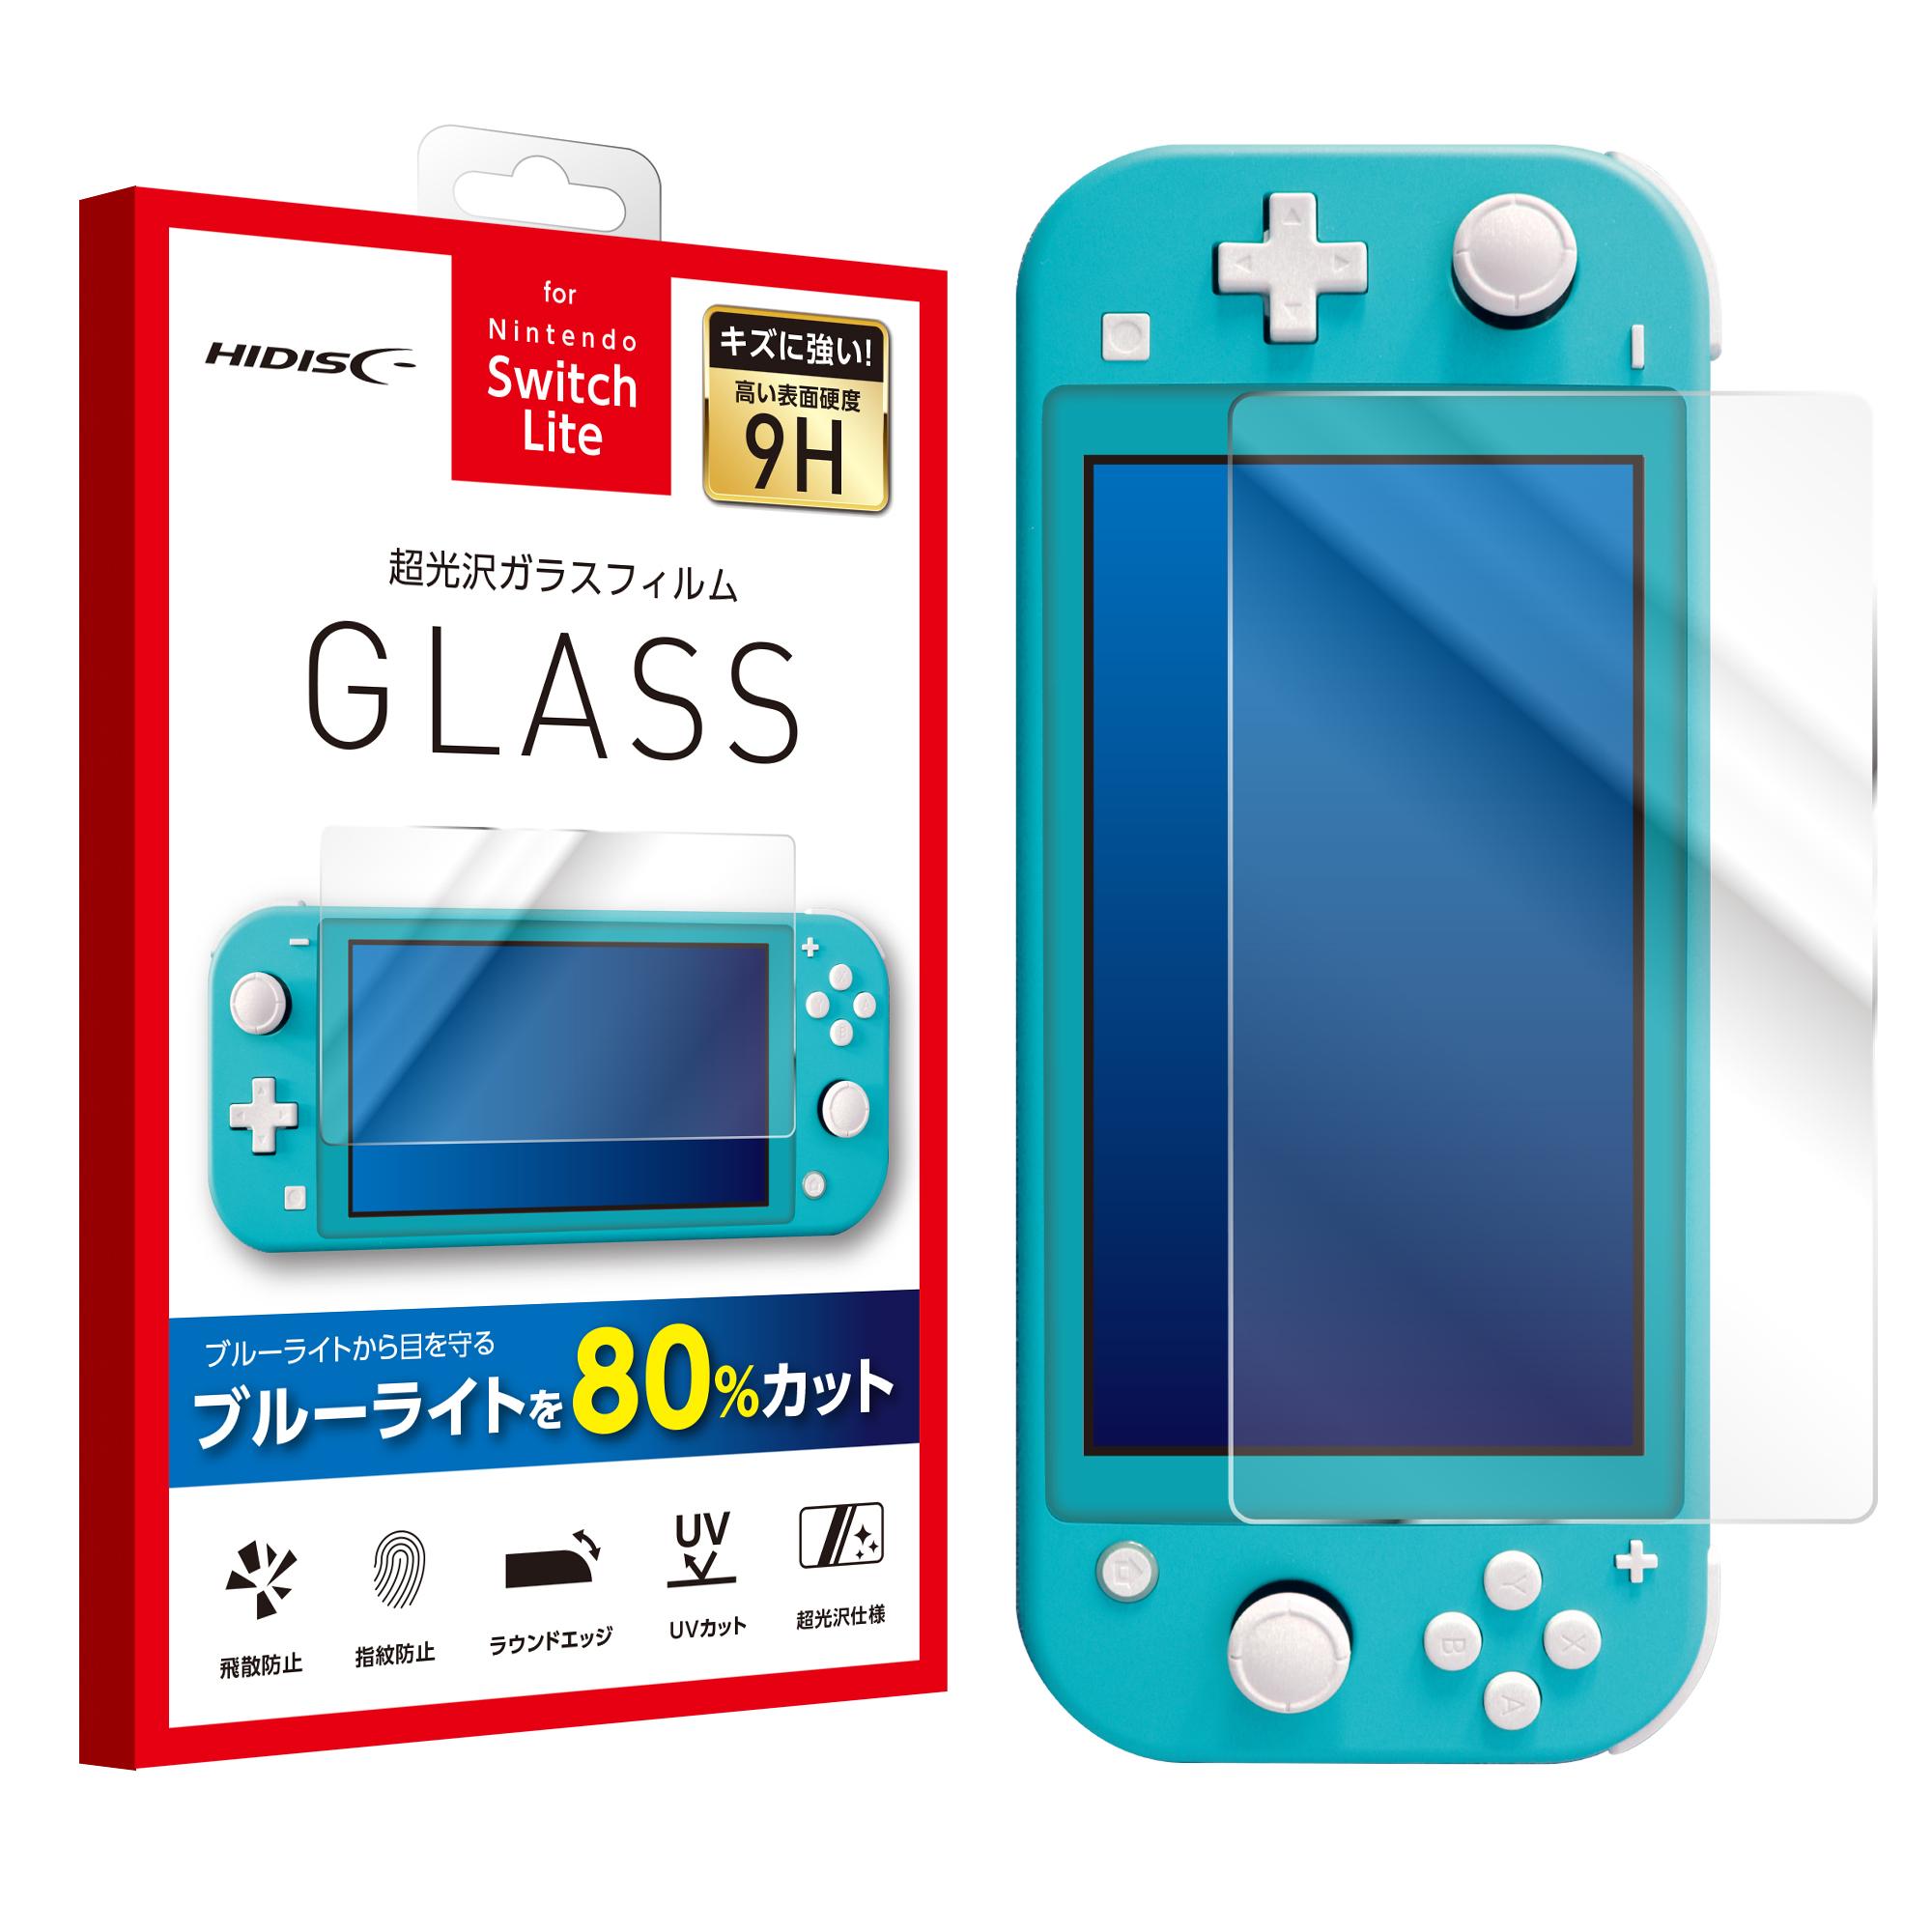 HIDISC 2.5D強化保護ガラスフィルム for Nintendo Switch Lite ブルーライトカット機能付き